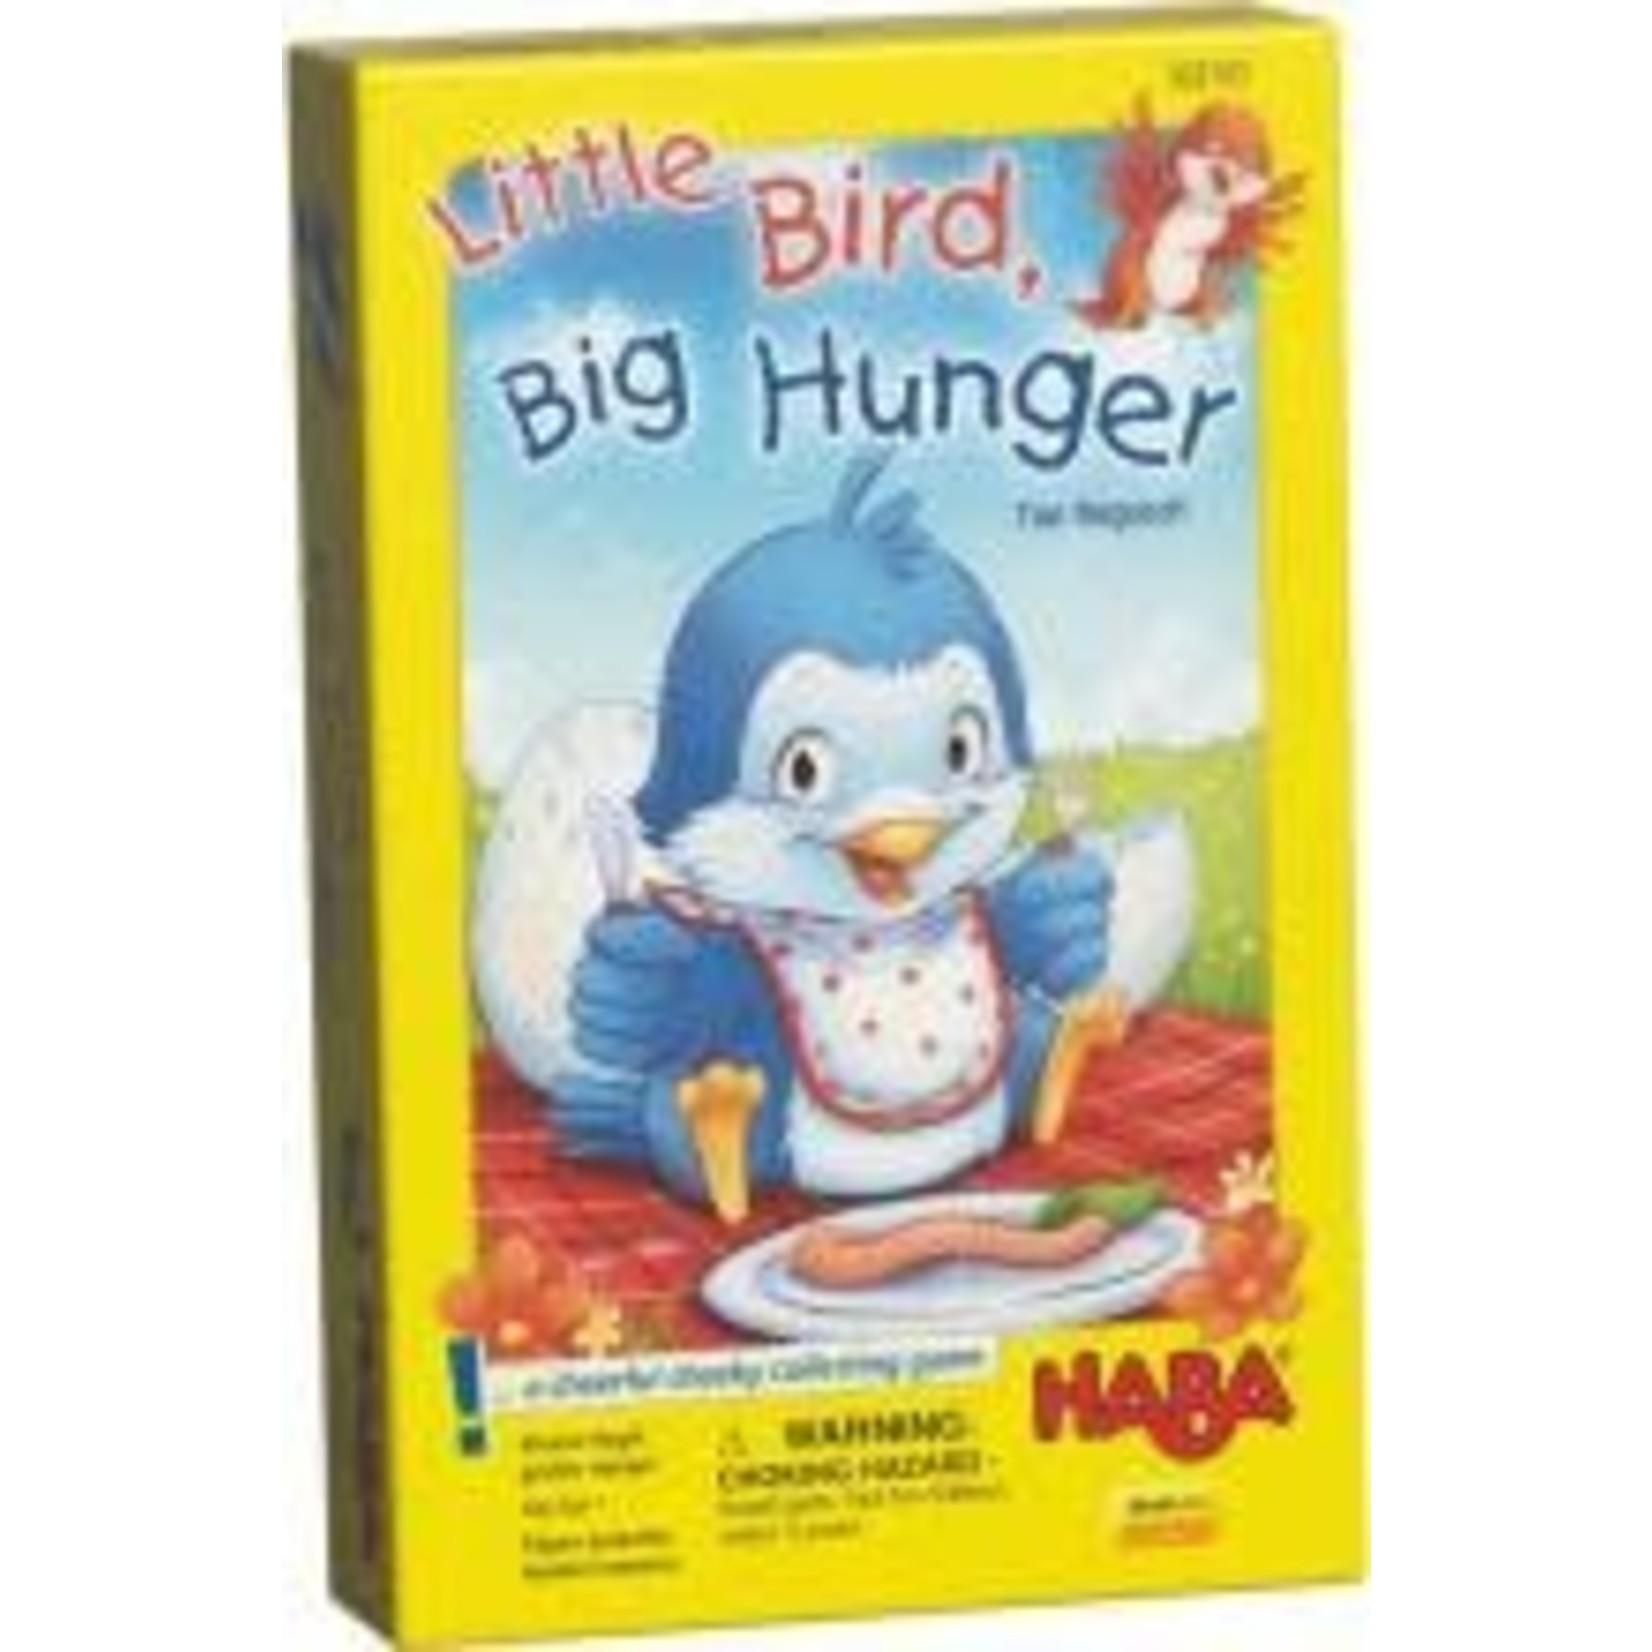 Haba Little Bird, Big Hunger